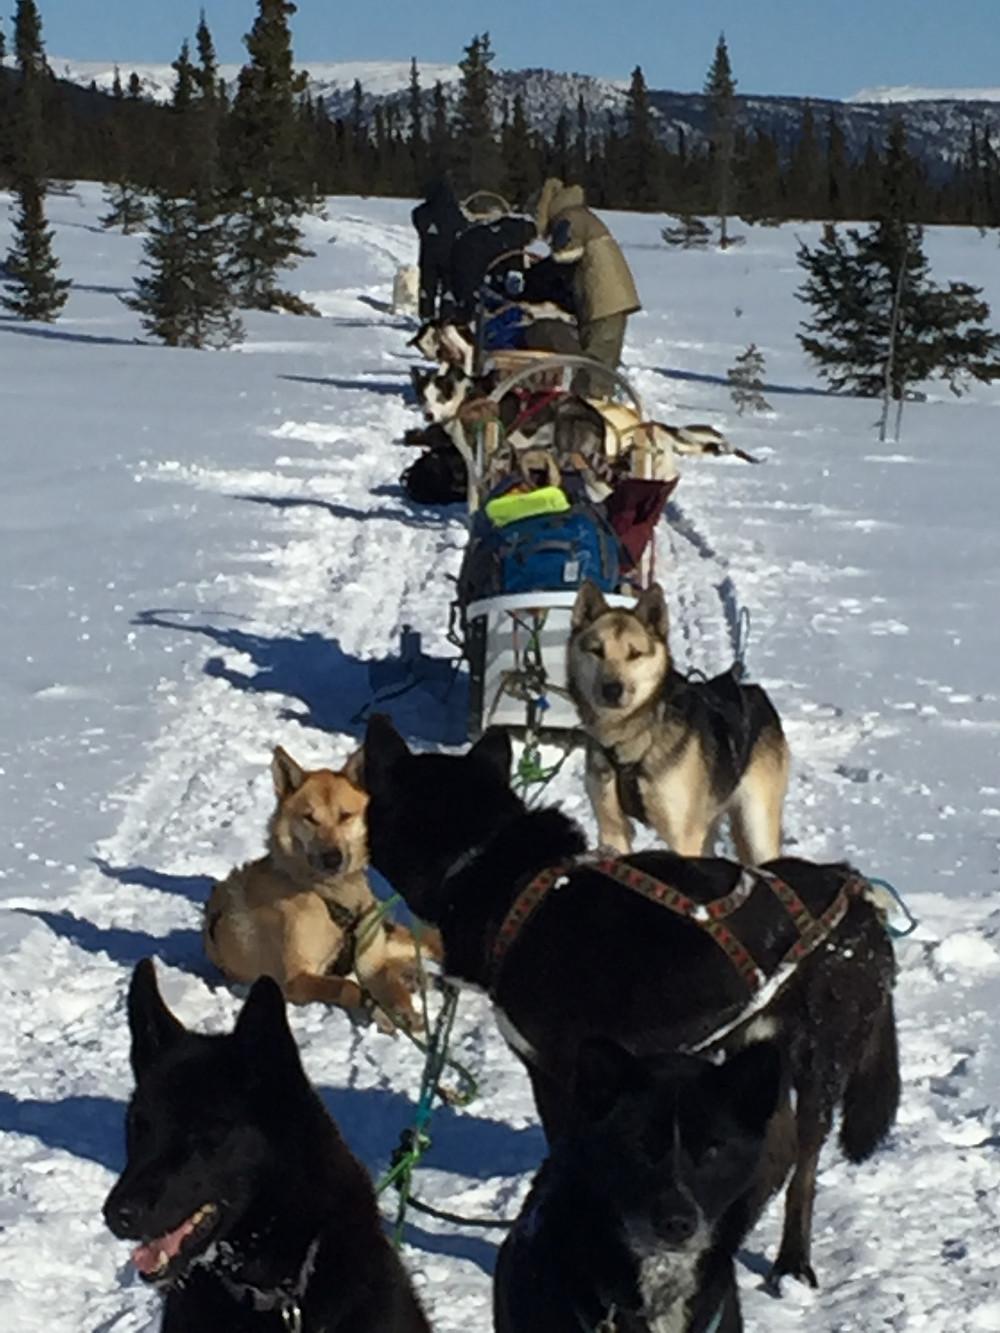 Alaska dogsledding - www.paradoxtravels.com